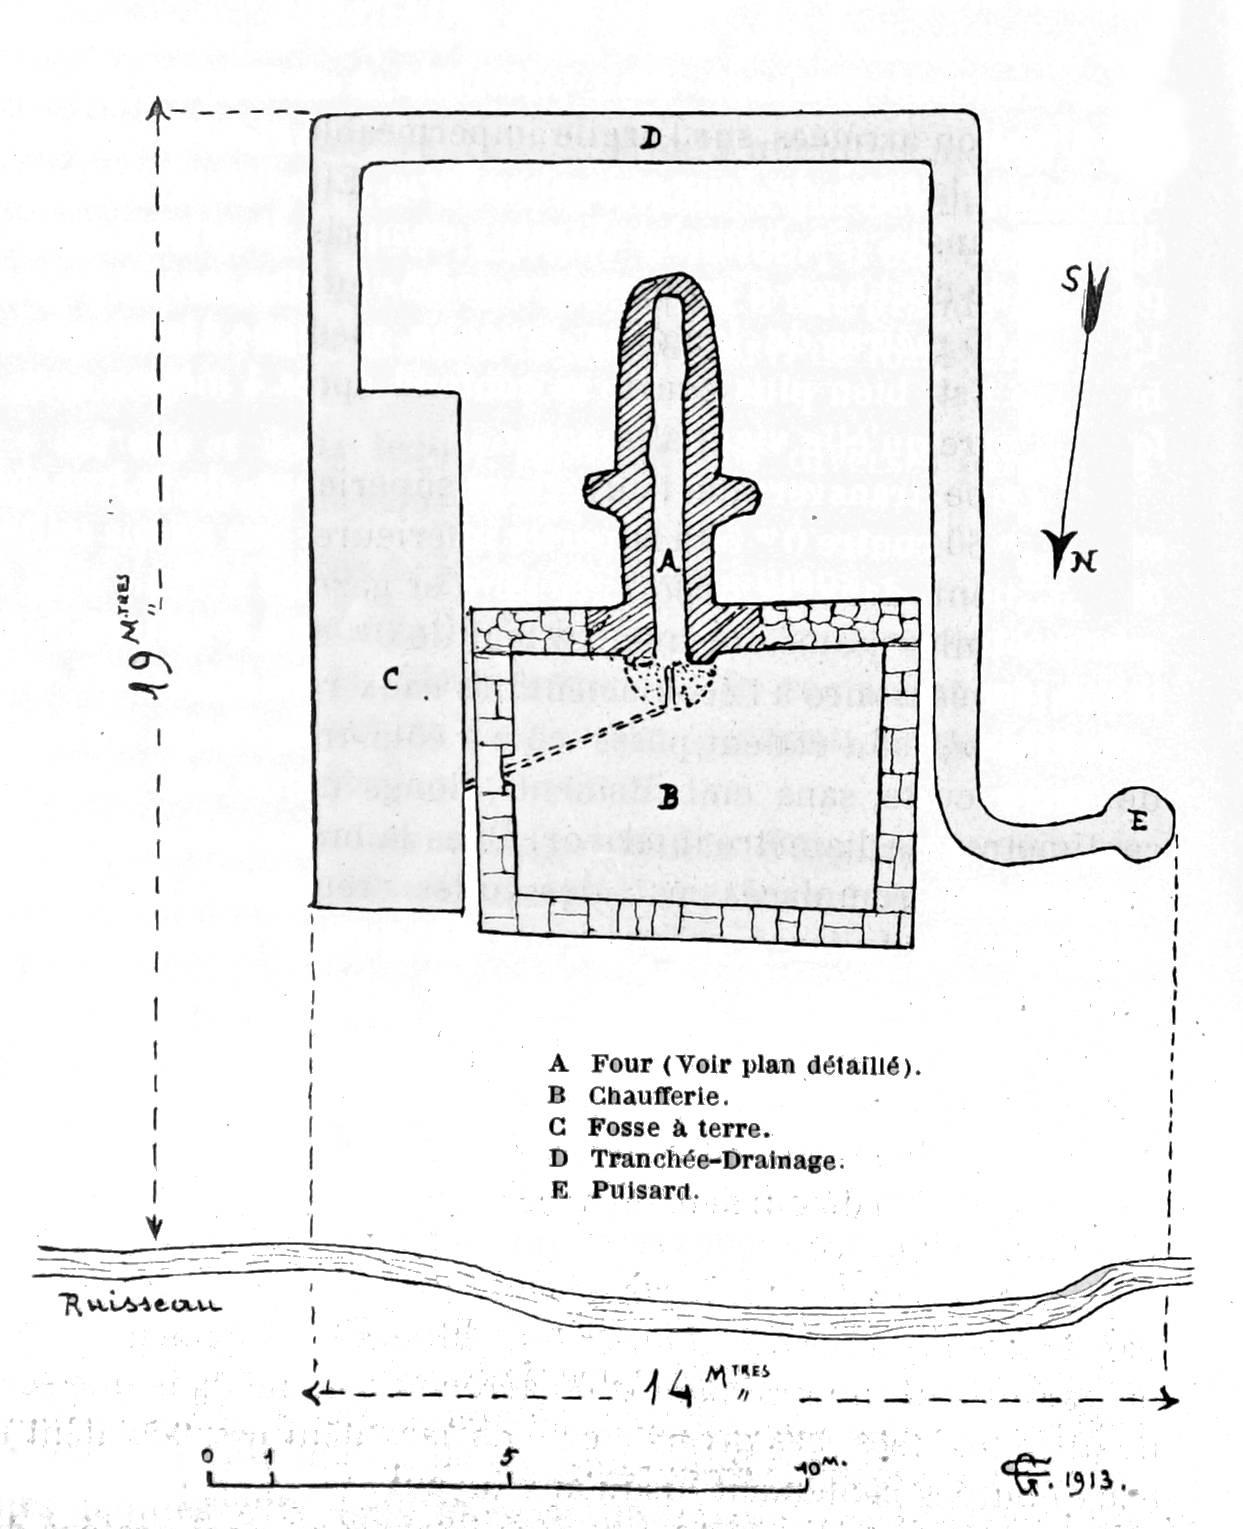 Filepotier pont des rmes 33514g wikimedia commons filepotier pont des rmes 33514g ccuart Gallery